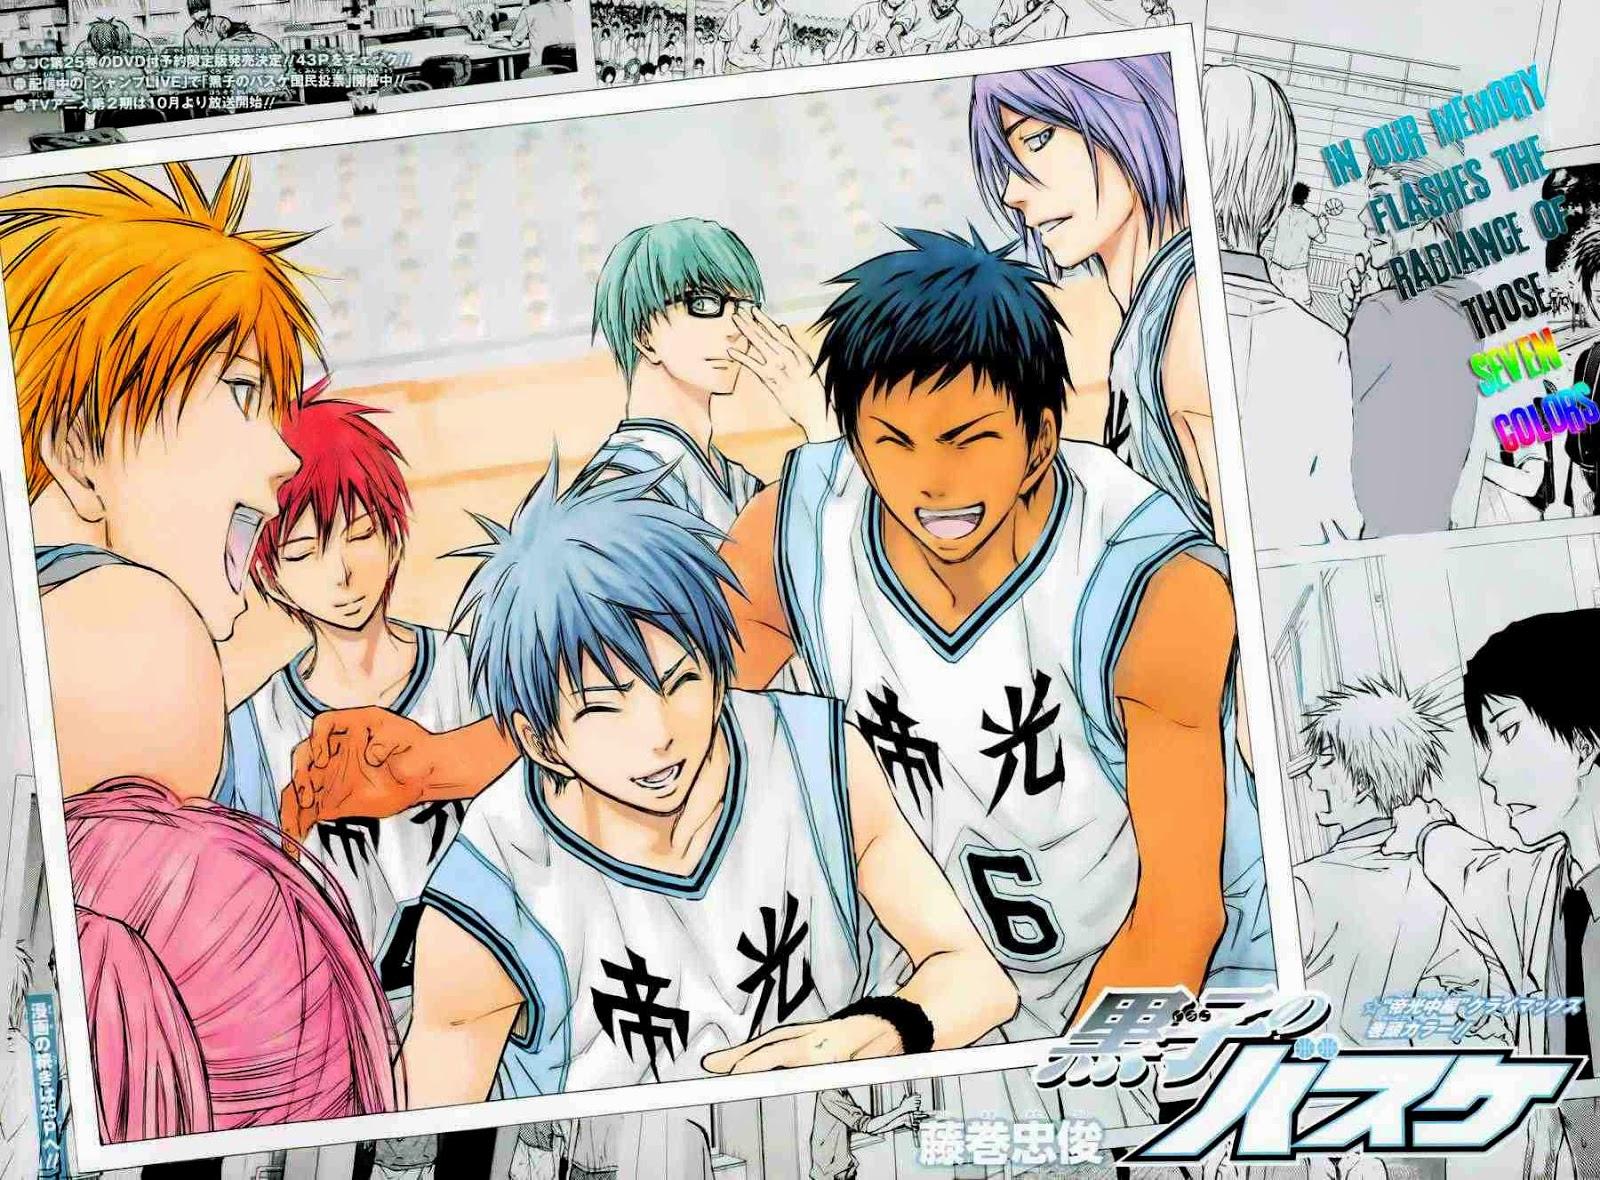 Kuroko no Basket Manga Chapter 226 - Image 01-02